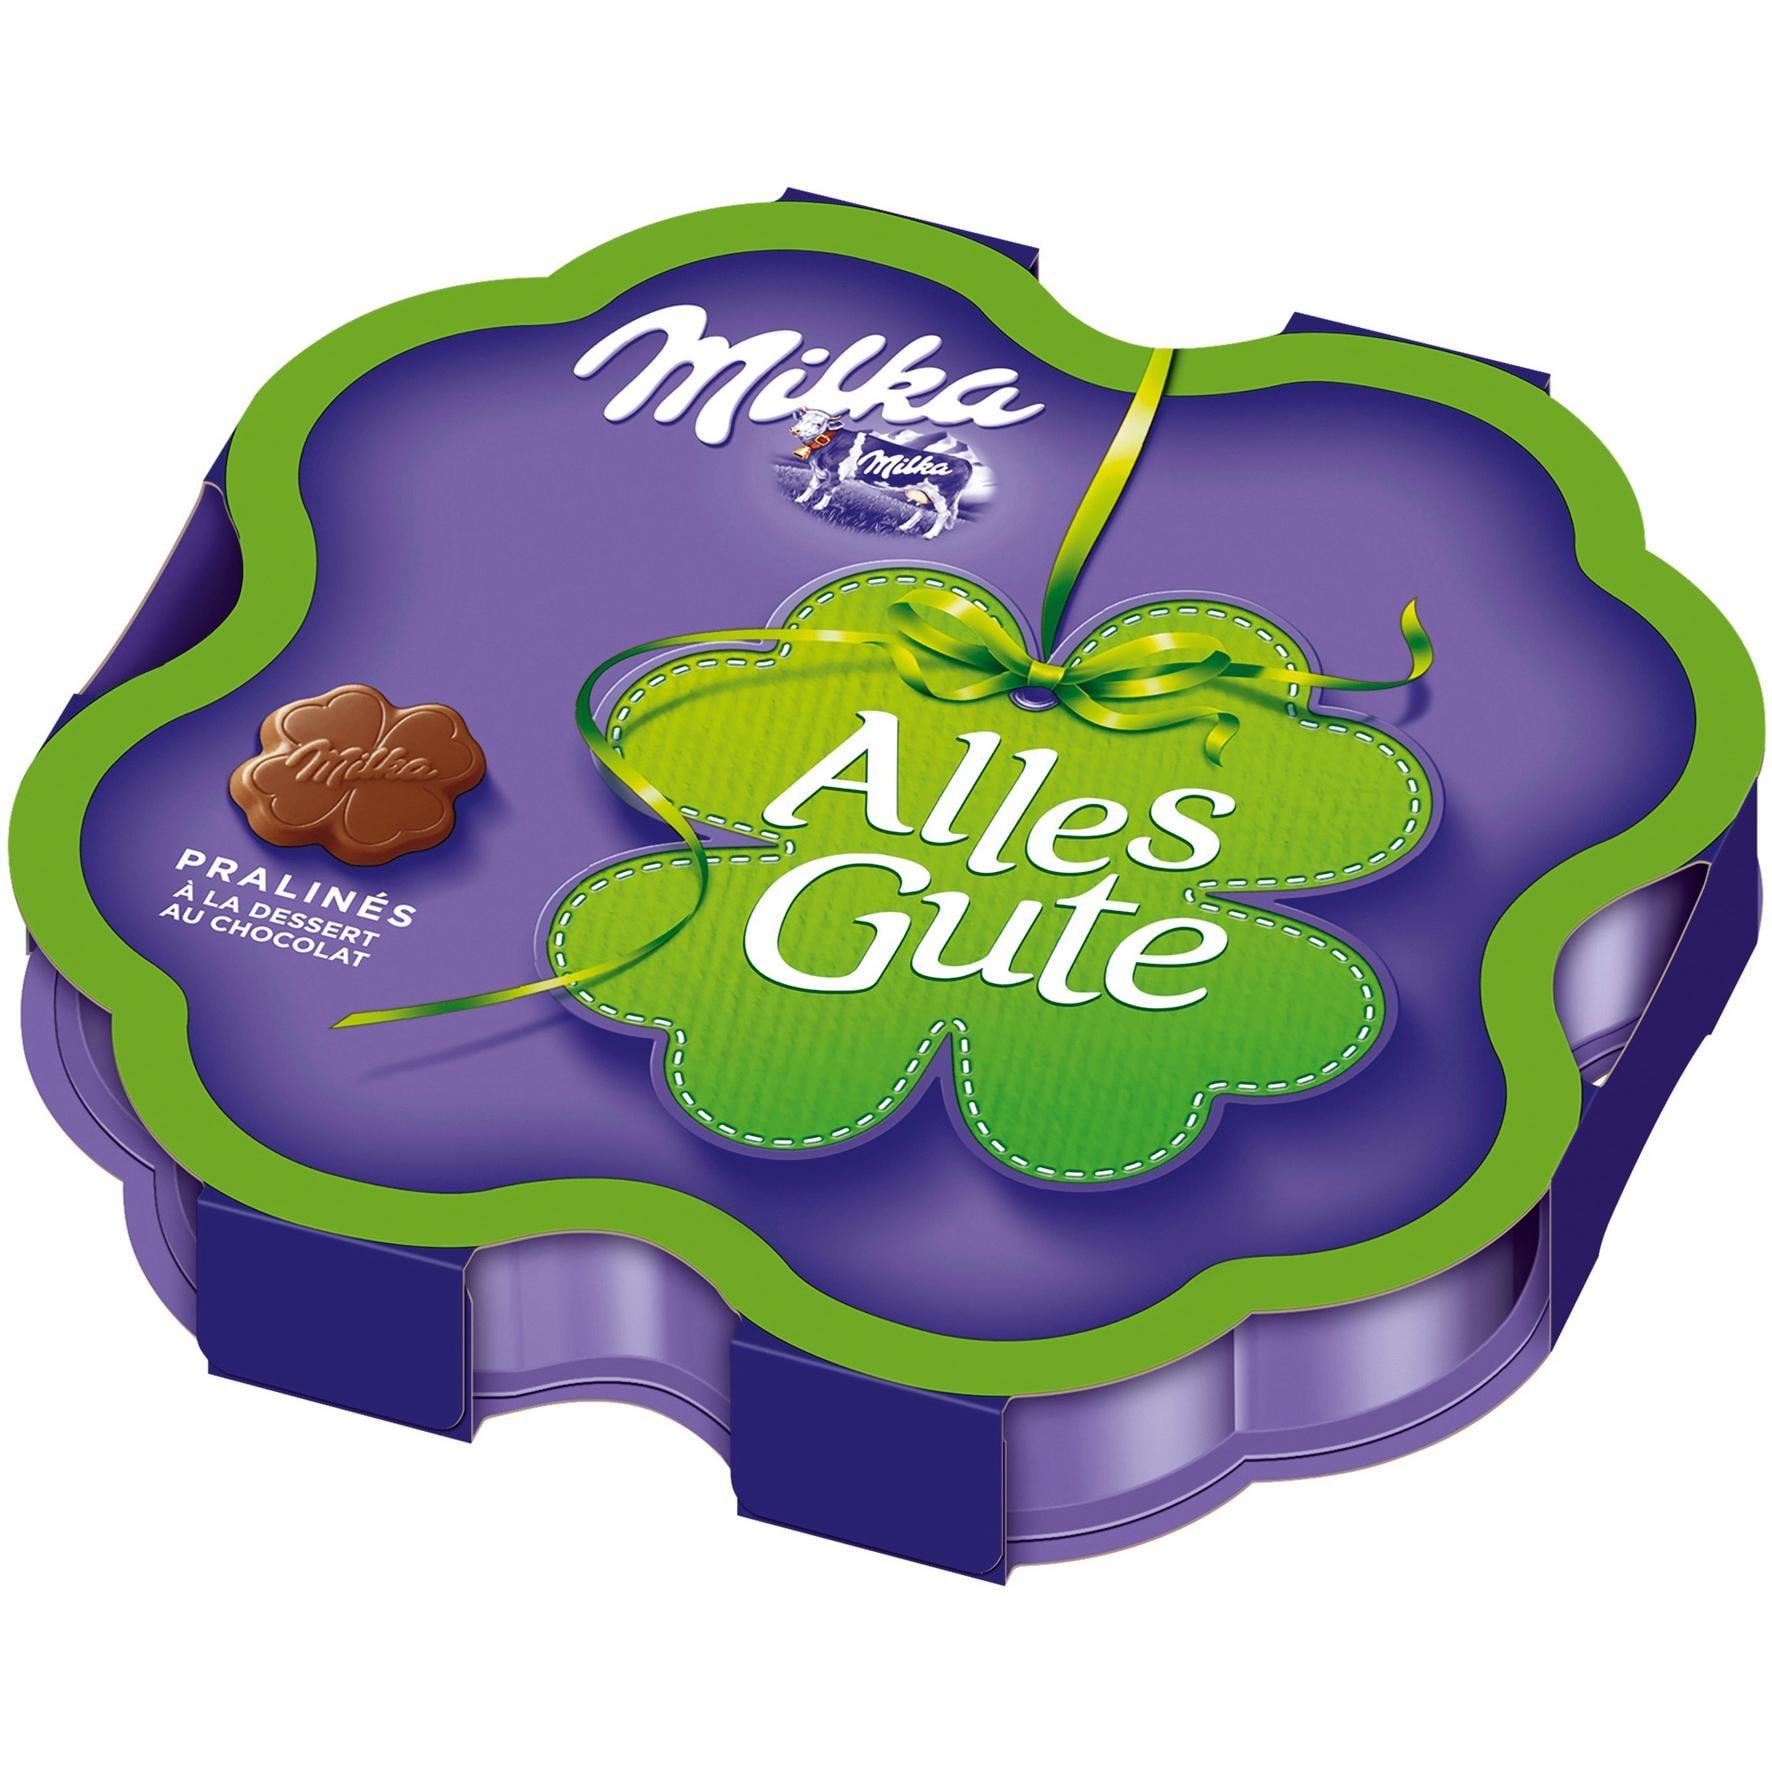 Milka - Alles Gute Pralinen Schokolade - 50g